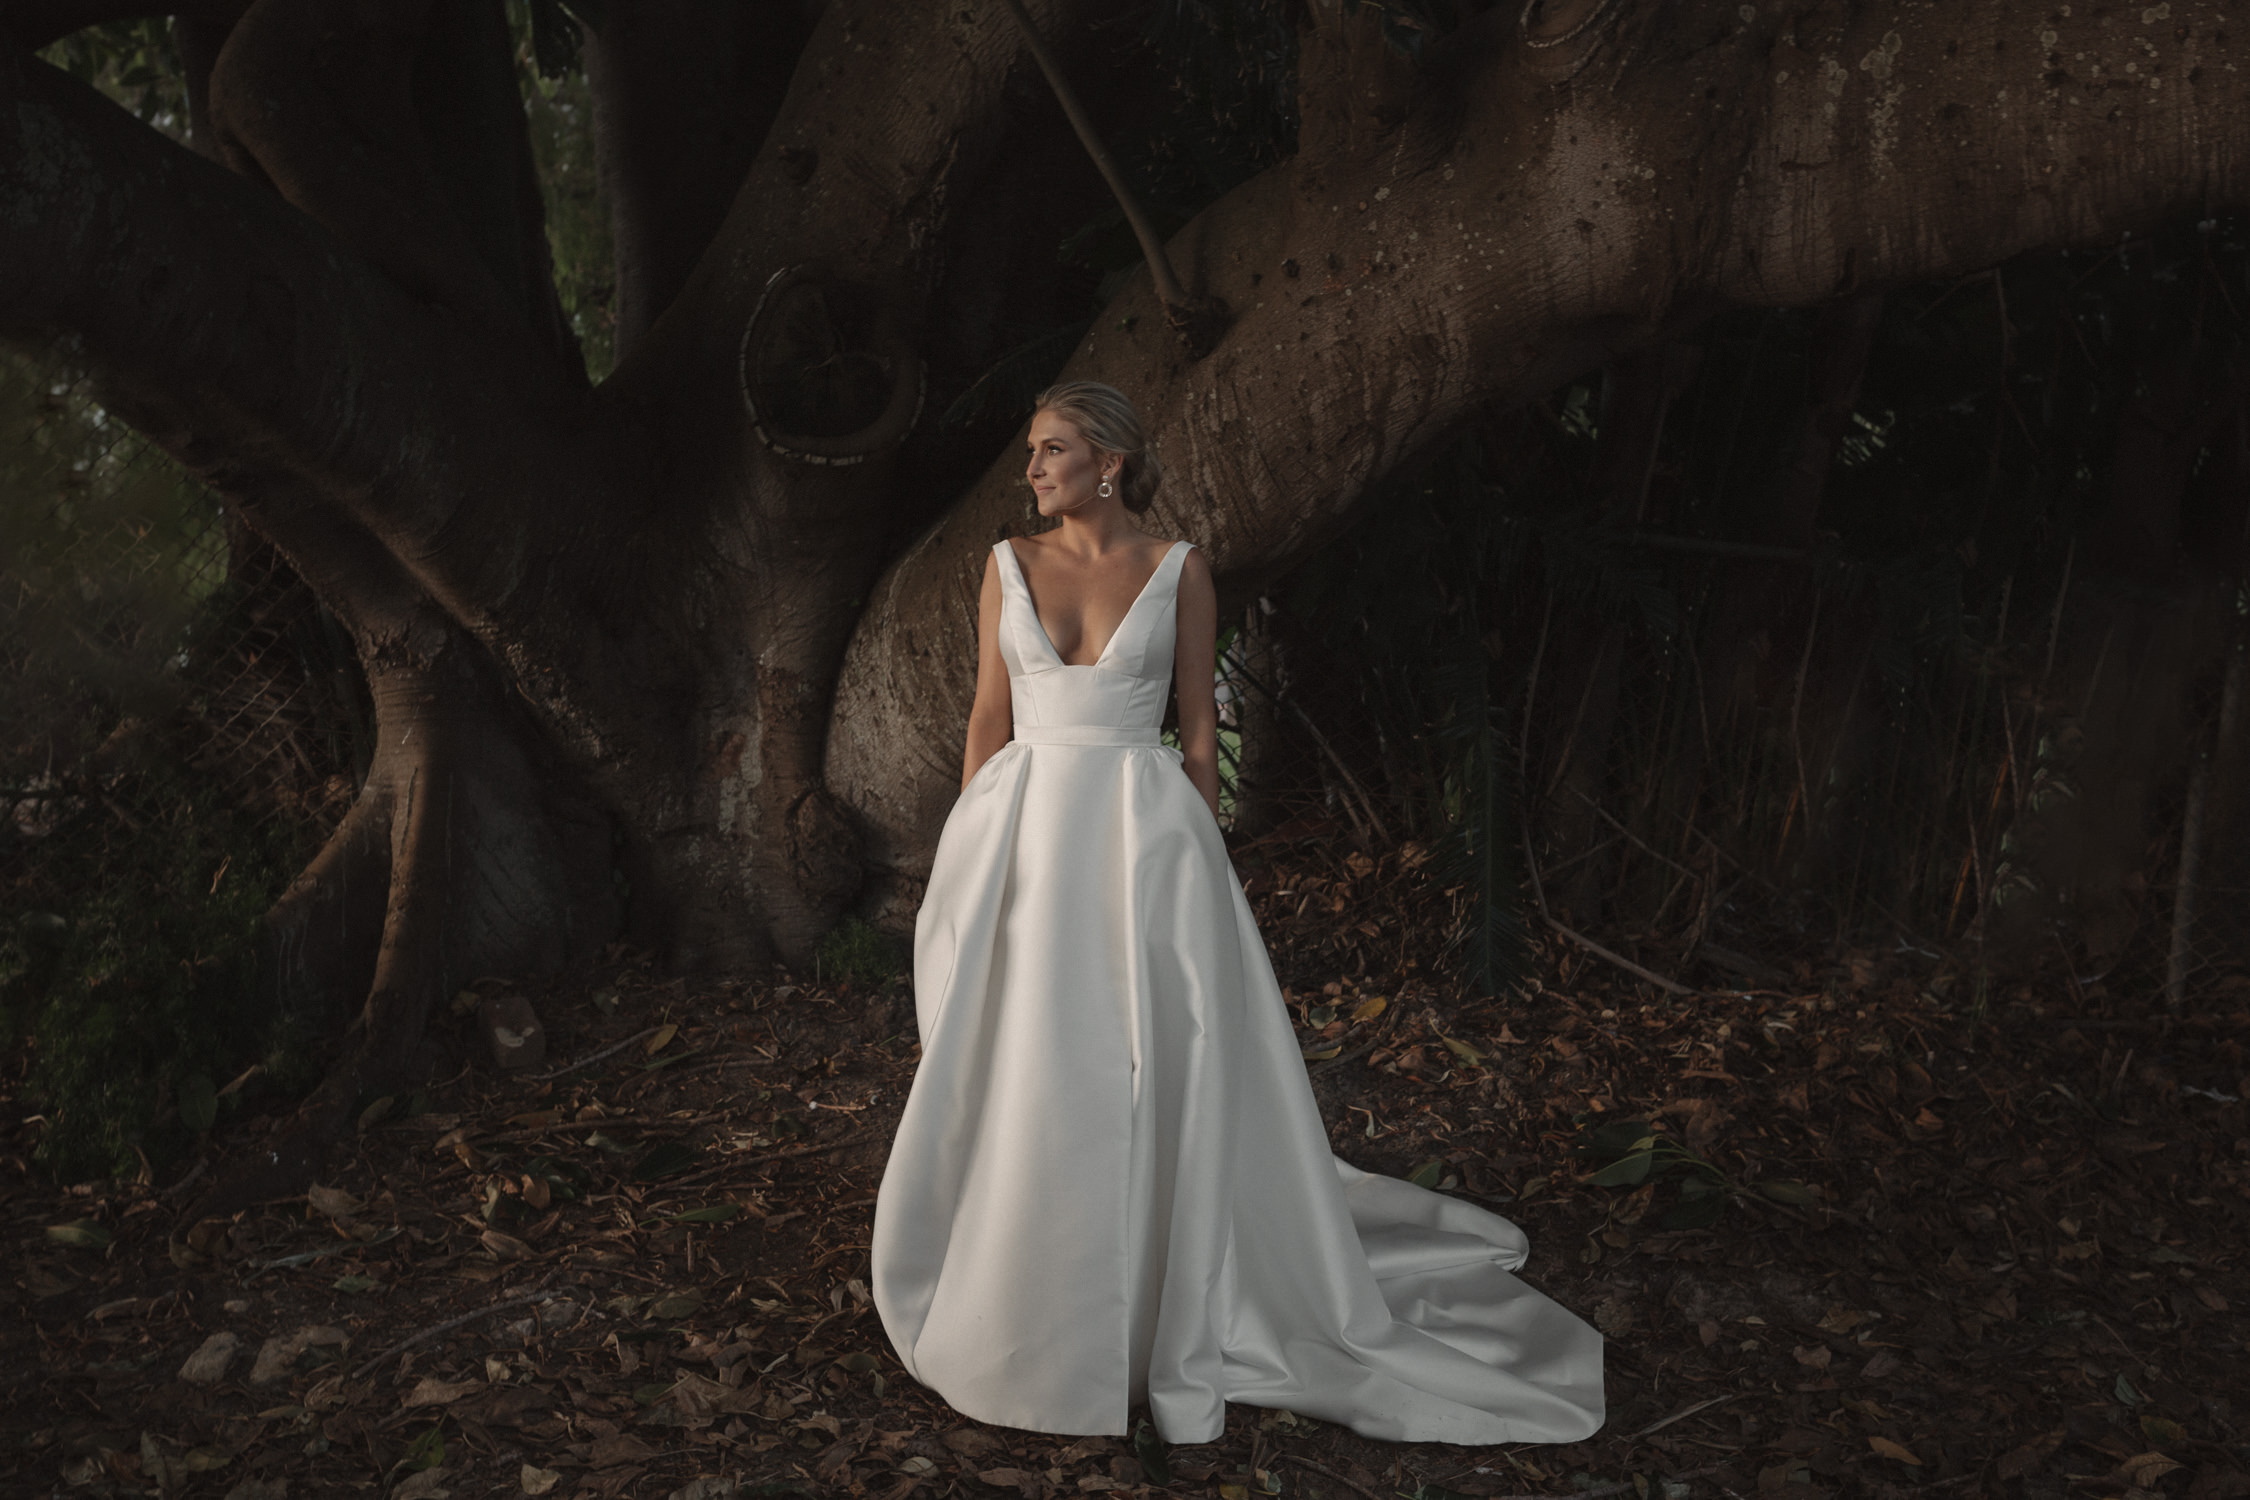 wedding-venue-at-night